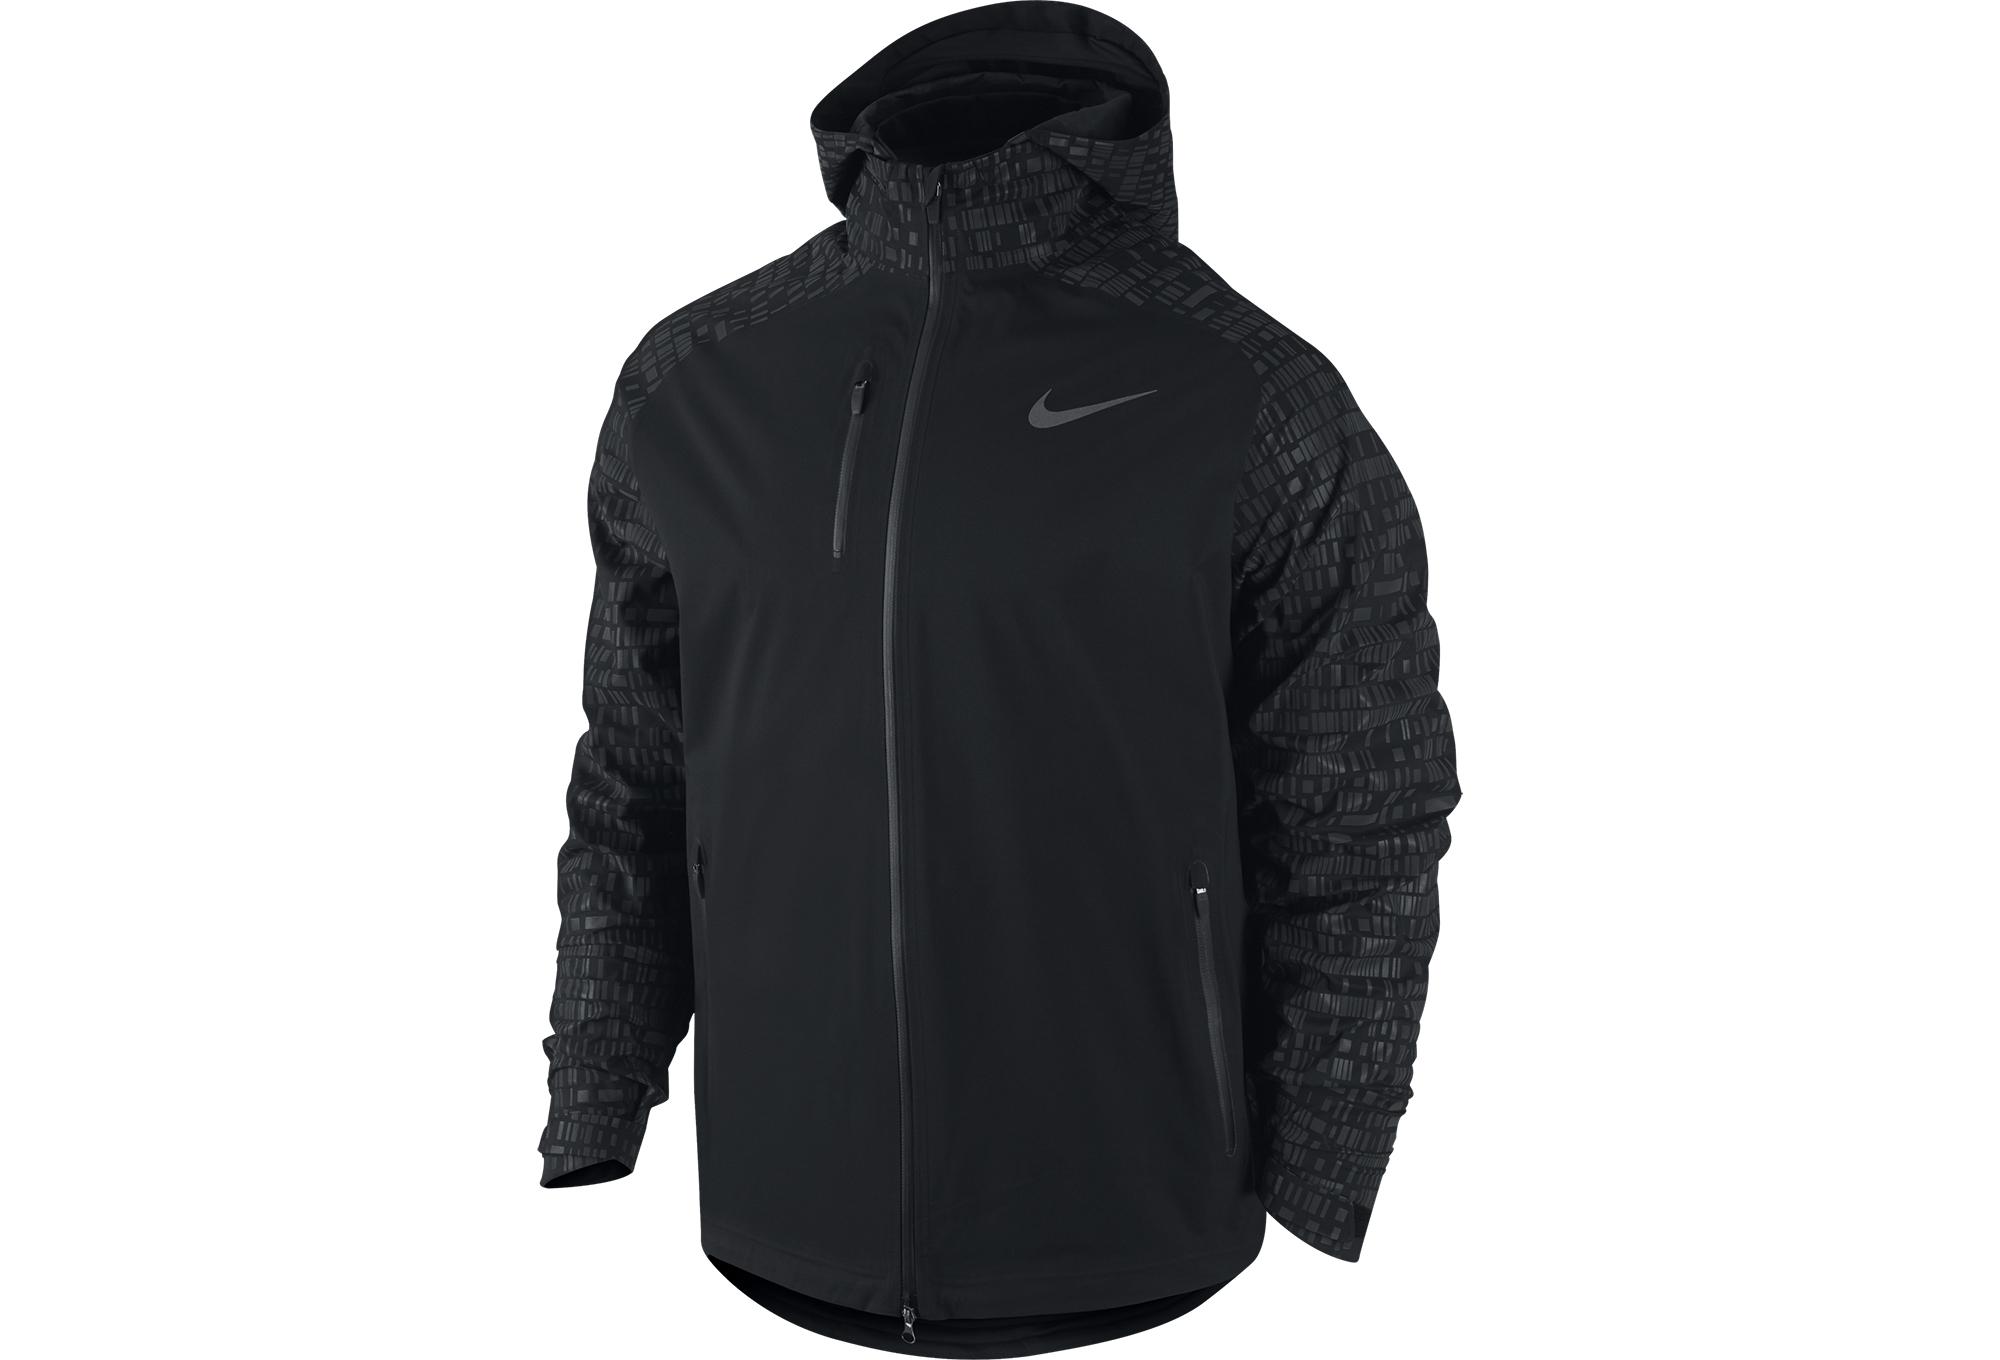 Noir Nike Imperméable Homme Hypershield Veste Flash fUFTw